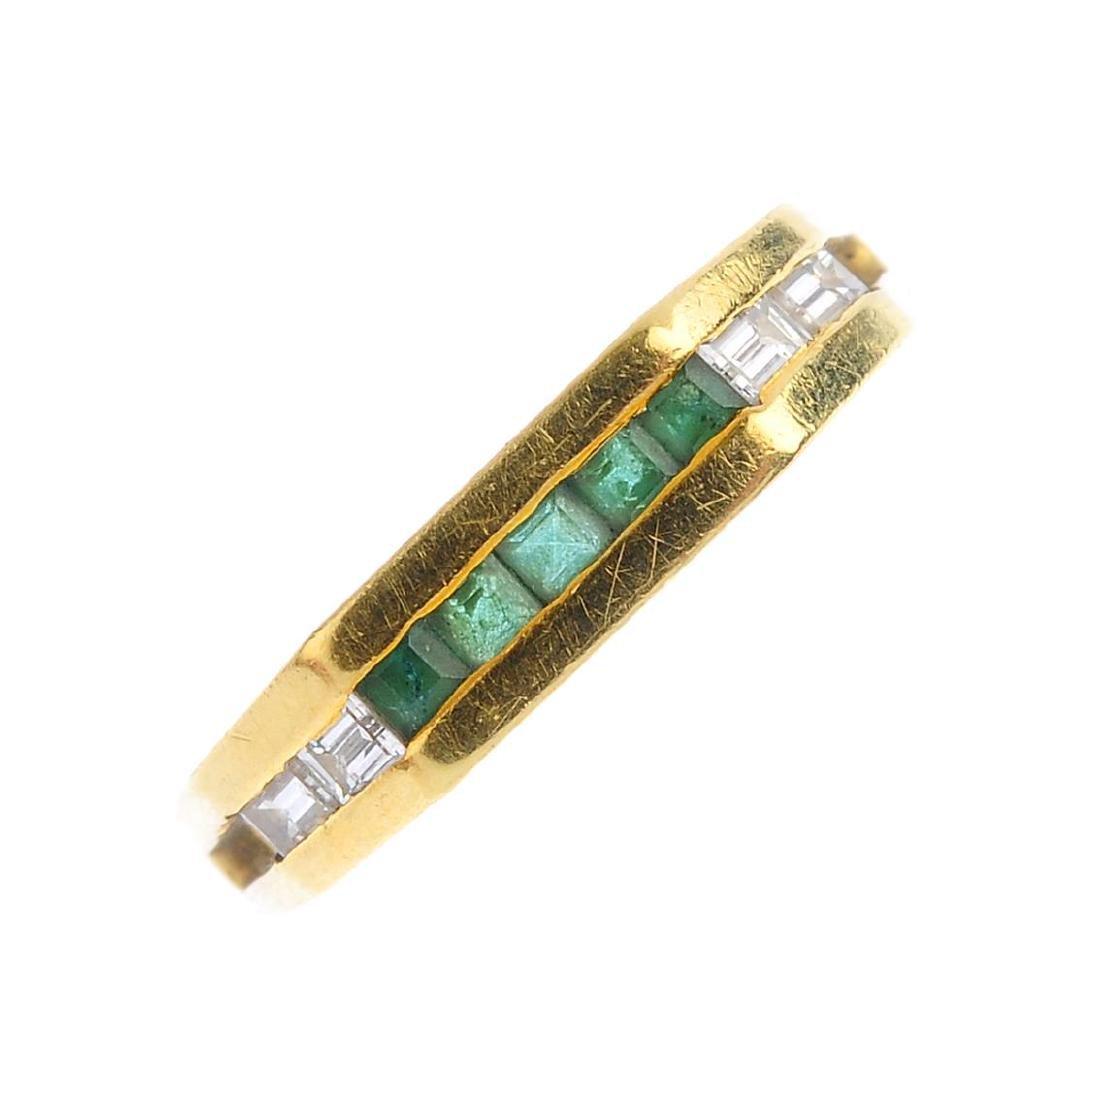 An emerald and diamond ring. Designed as a calibre-cut